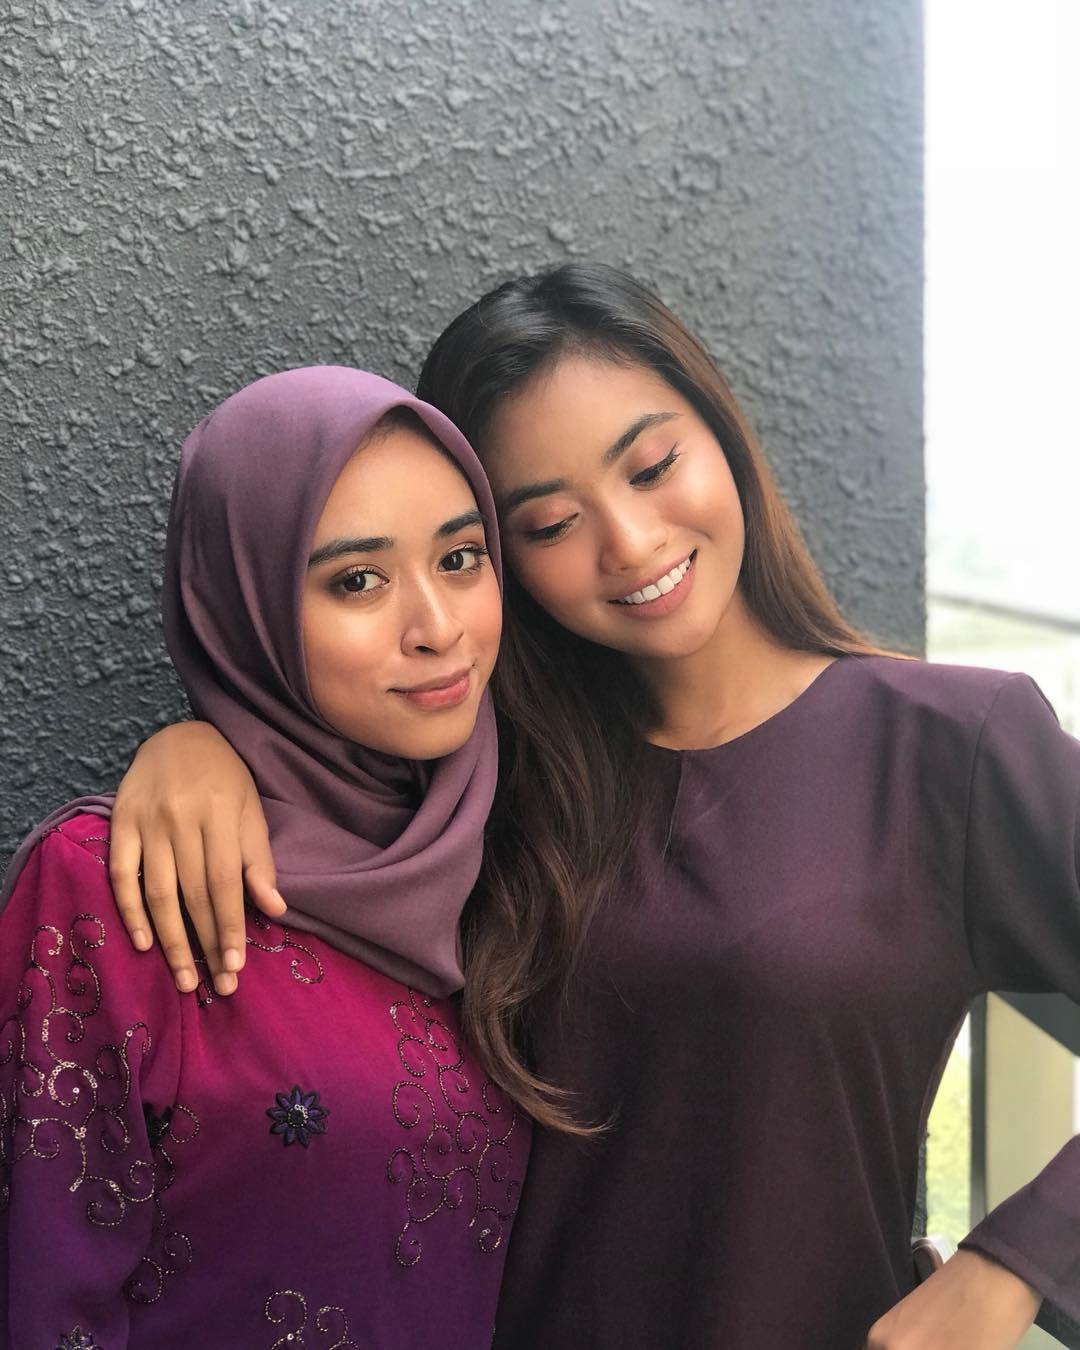 Blonde the pictures of virgin break malay girls